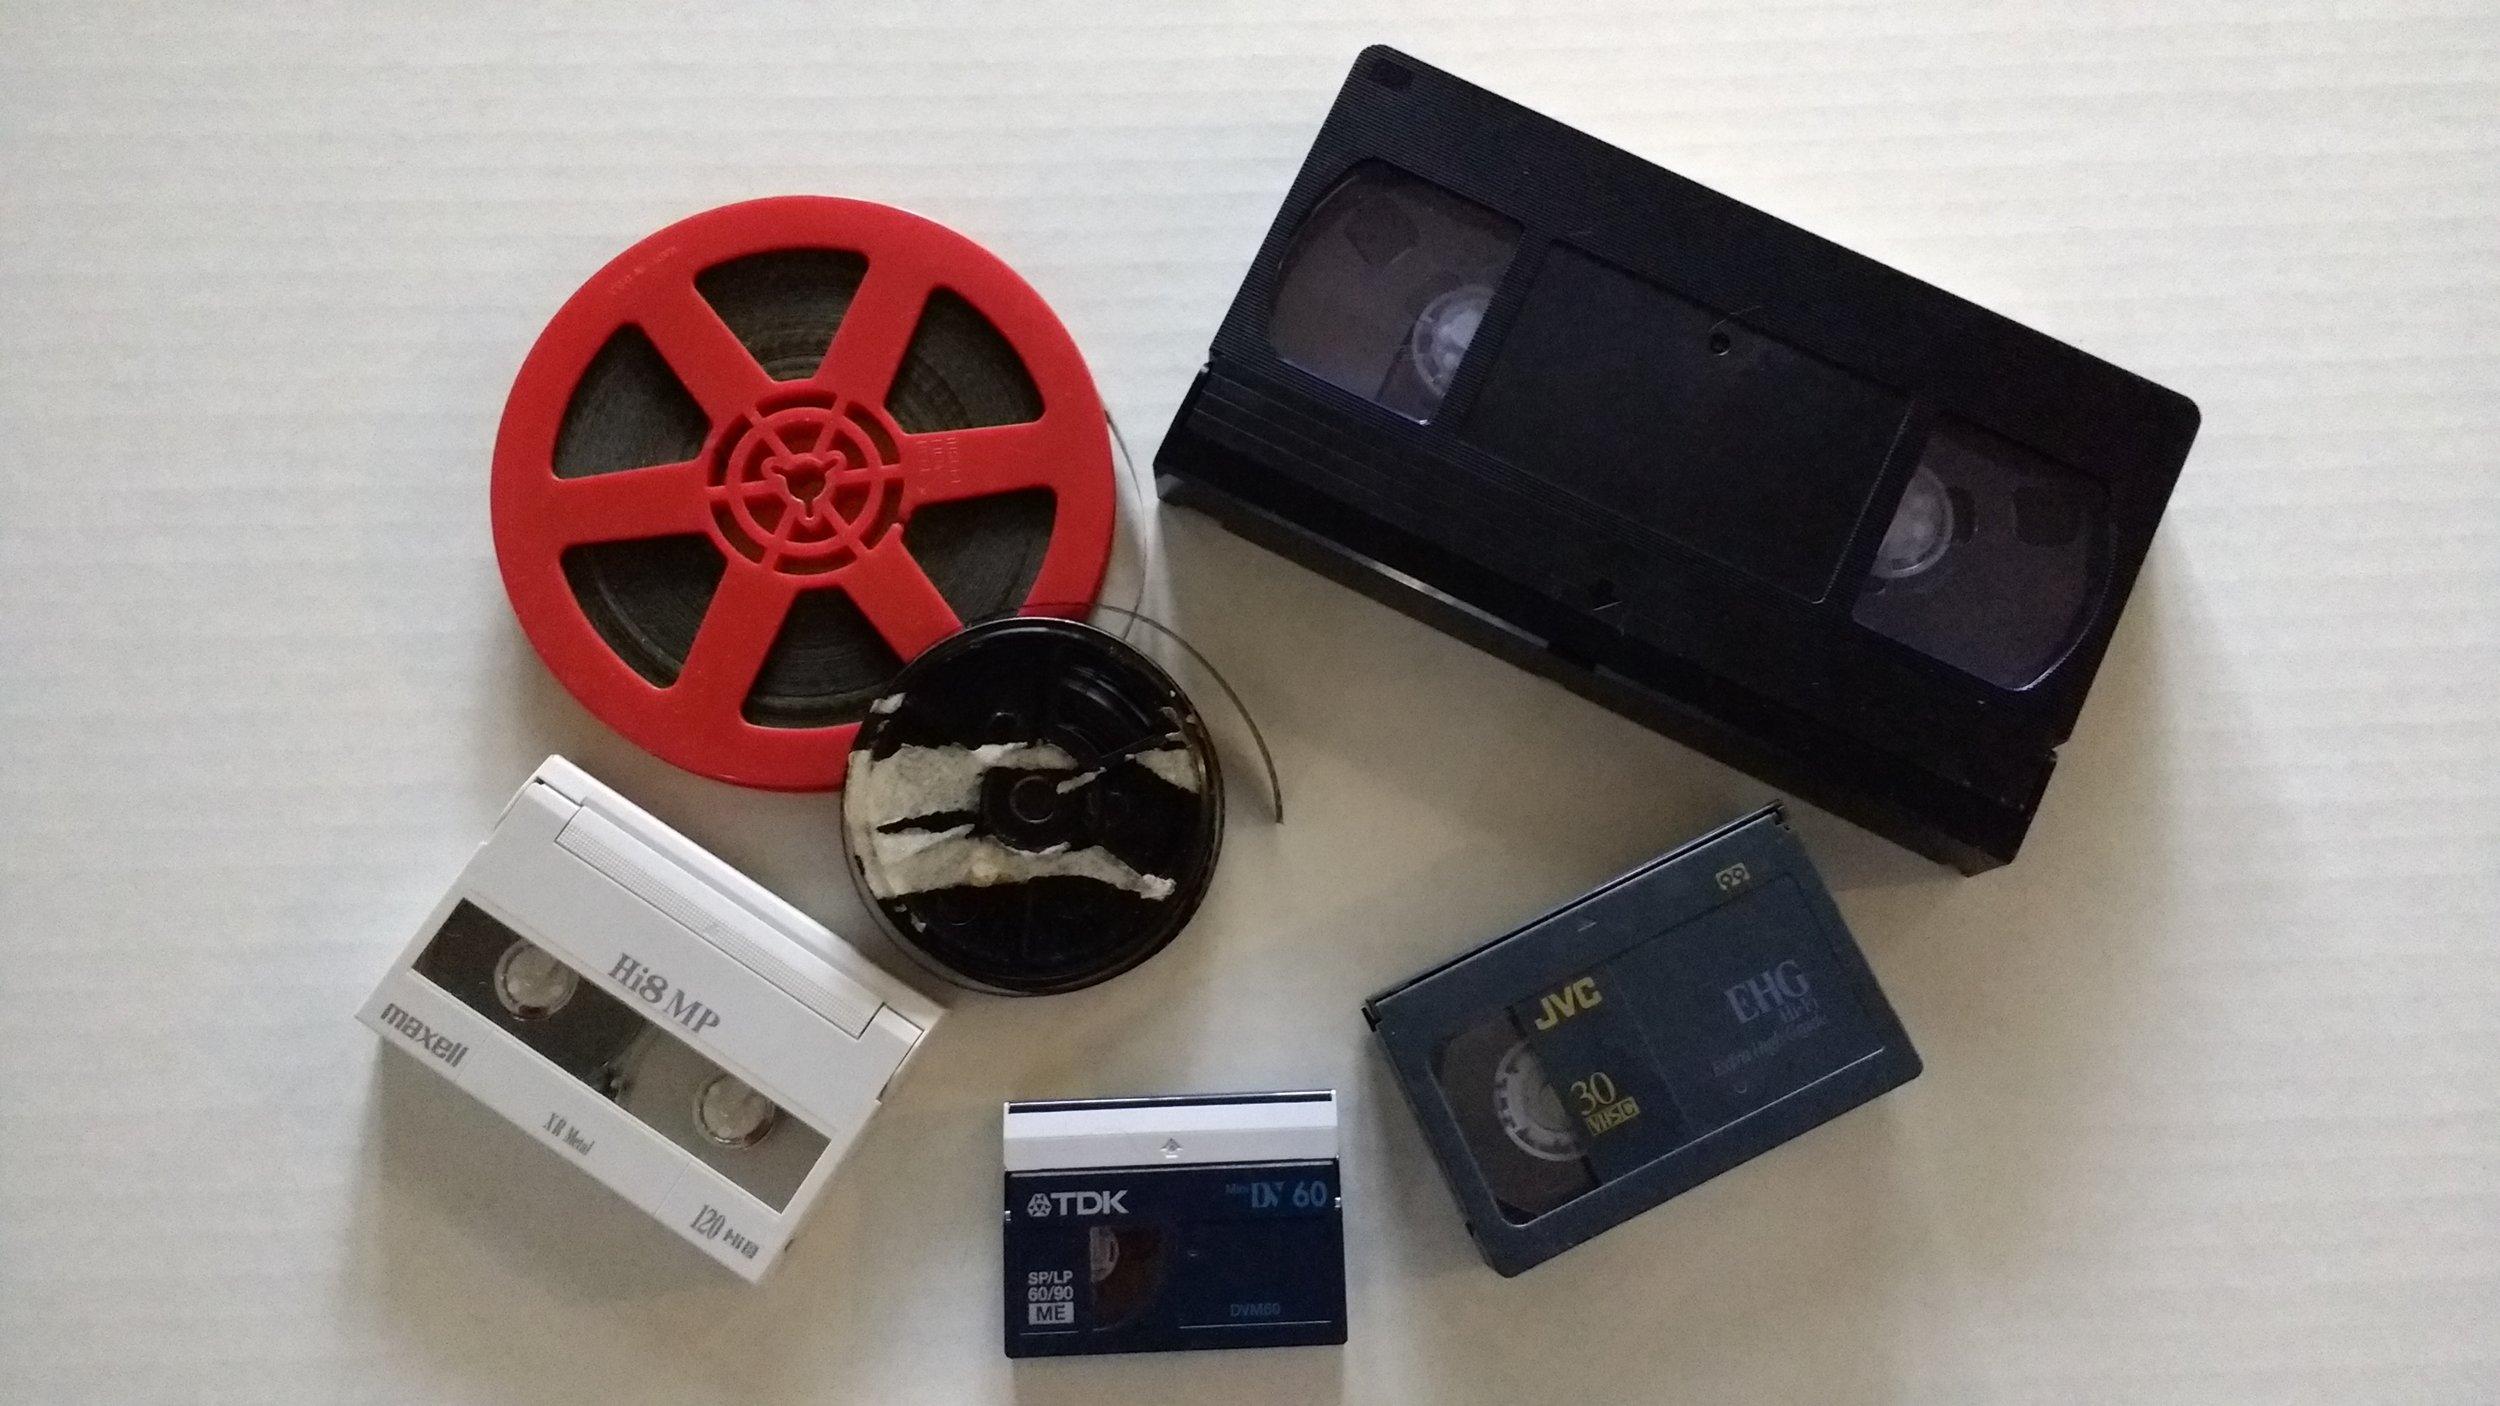 8mm, Super8, VHS, VHS-C, Hi8, and mini-DV conversion available.